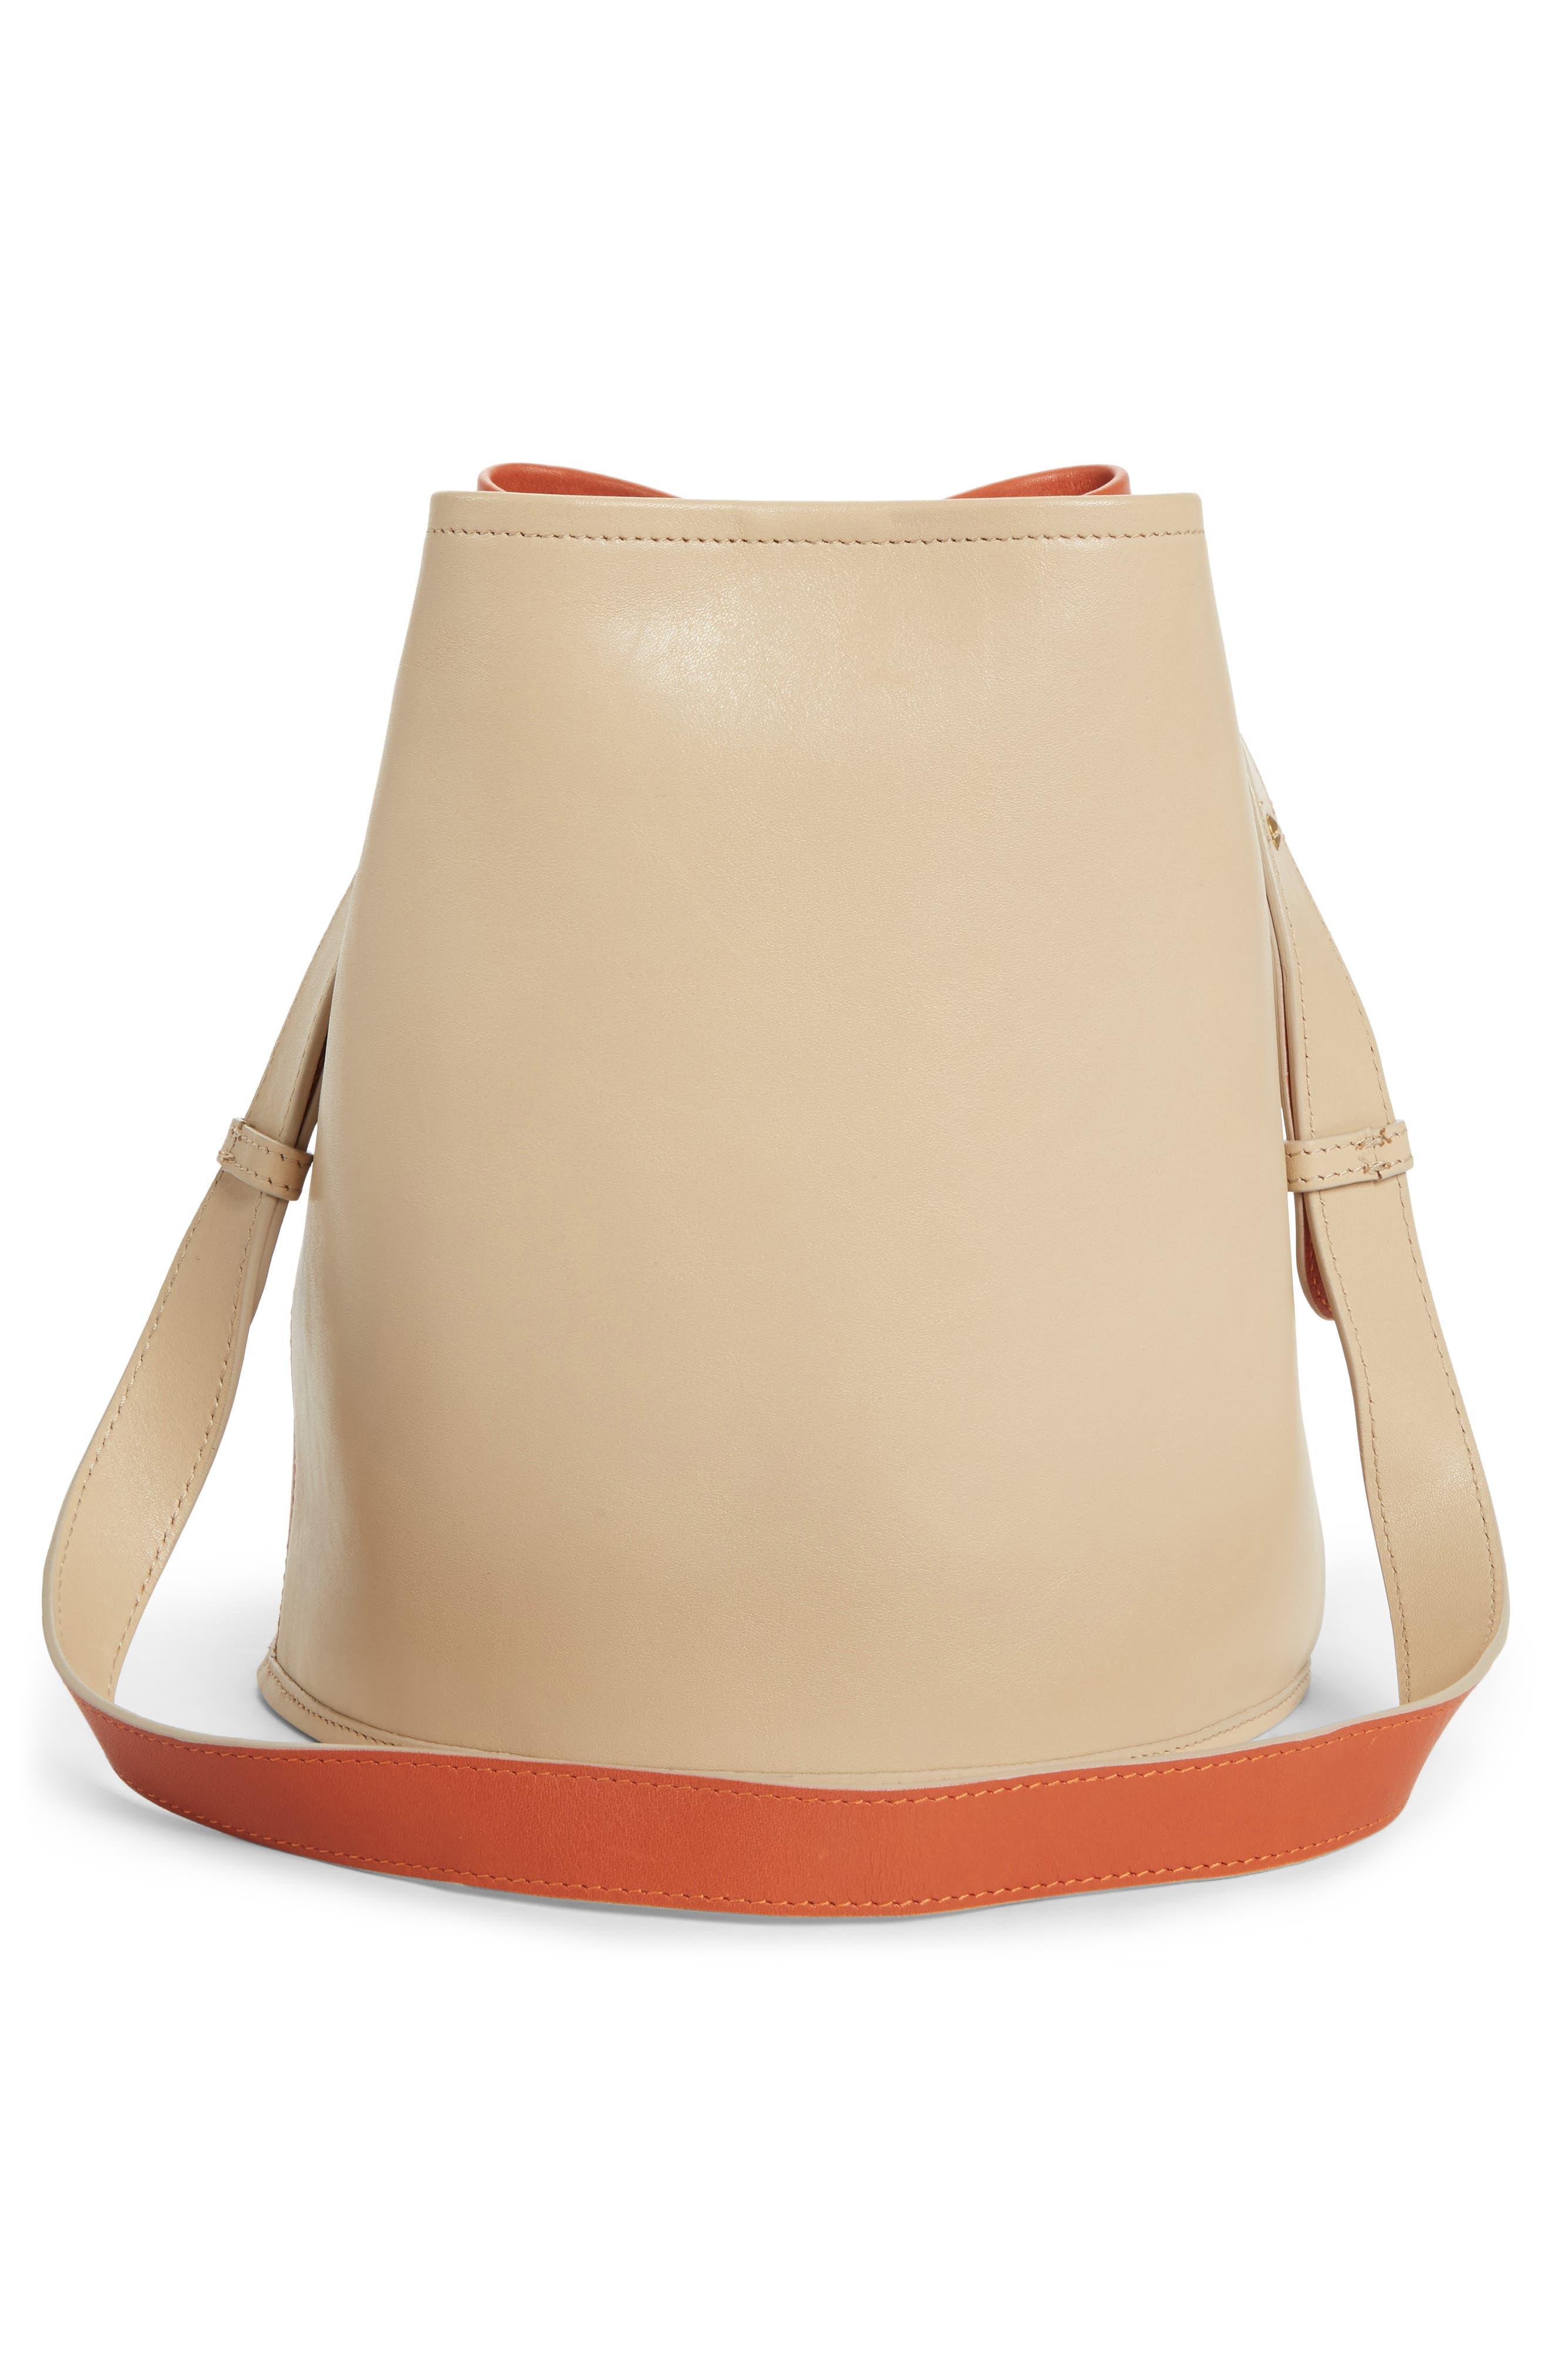 Small Bucket Bicolor Leather Bag,                             Alternate thumbnail 6, color,                             Clove/ Cappuccino